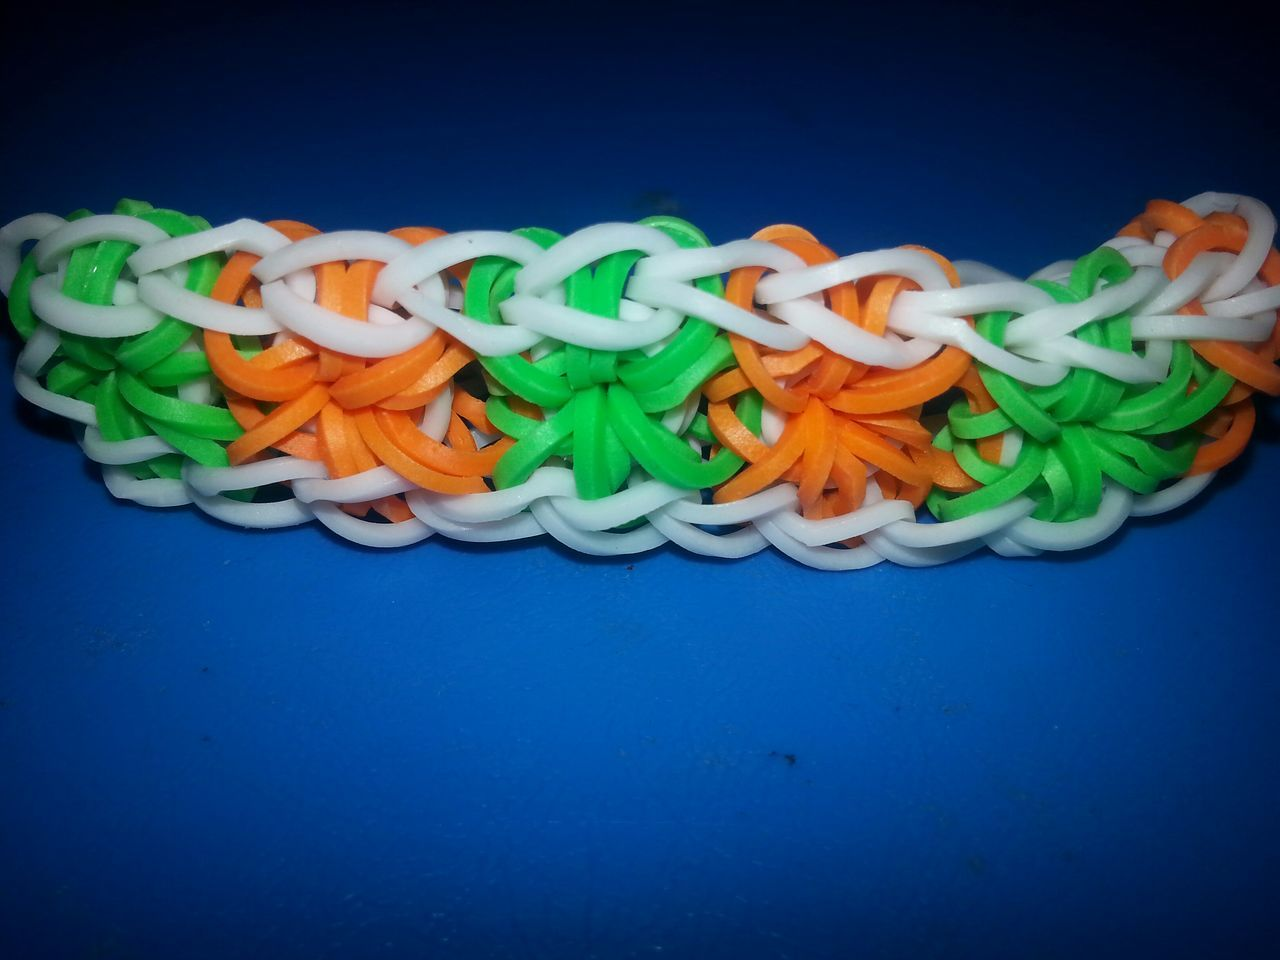 Braceletfleurs RainbowLoom Loomflowers Green Orange White Bracelet Artnouveau